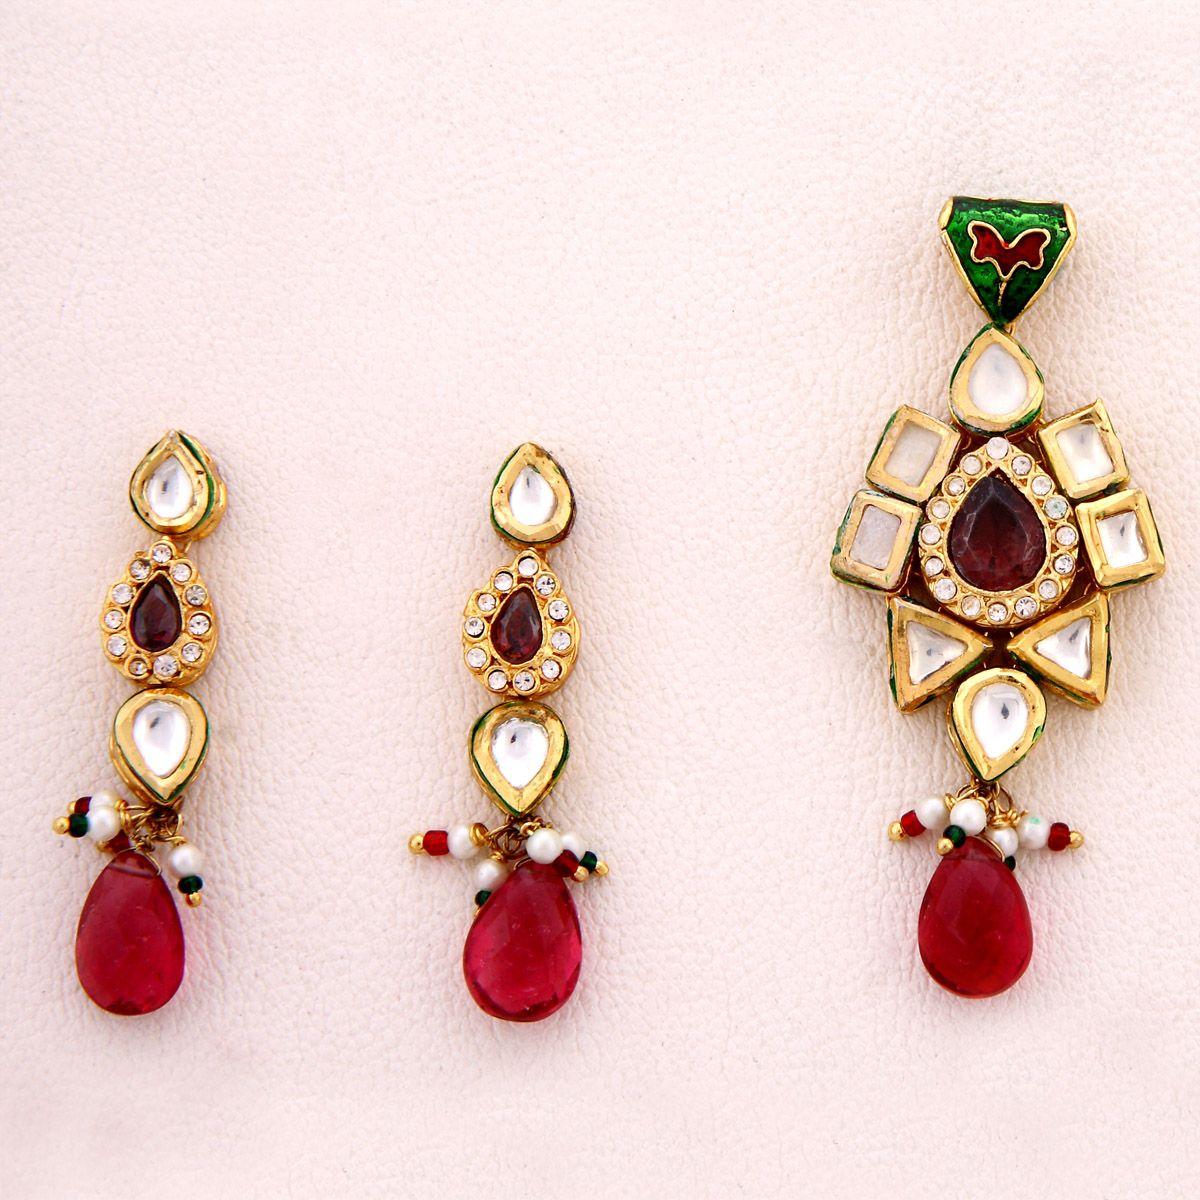 Kushals fashion jewellery kundan pendant earring jewellery